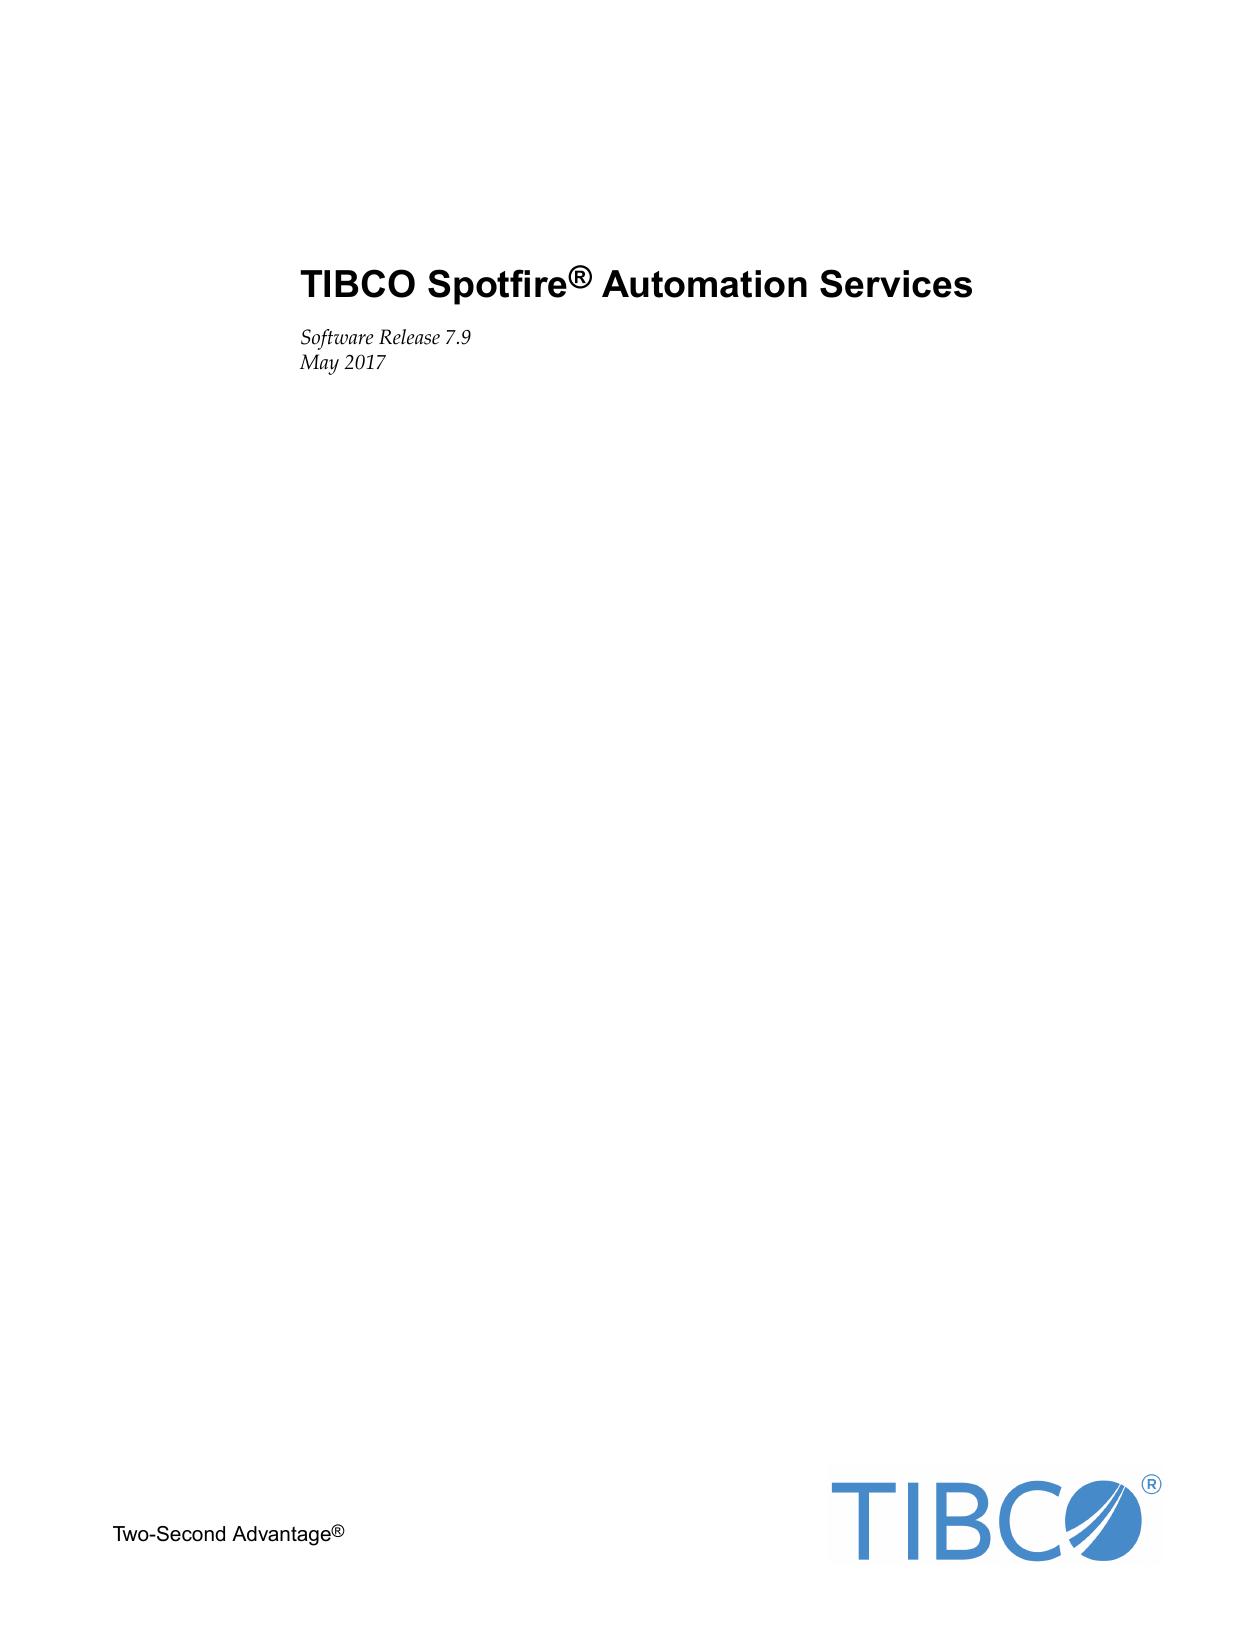 TIBCO Spotfire® Automation Services | manualzz com